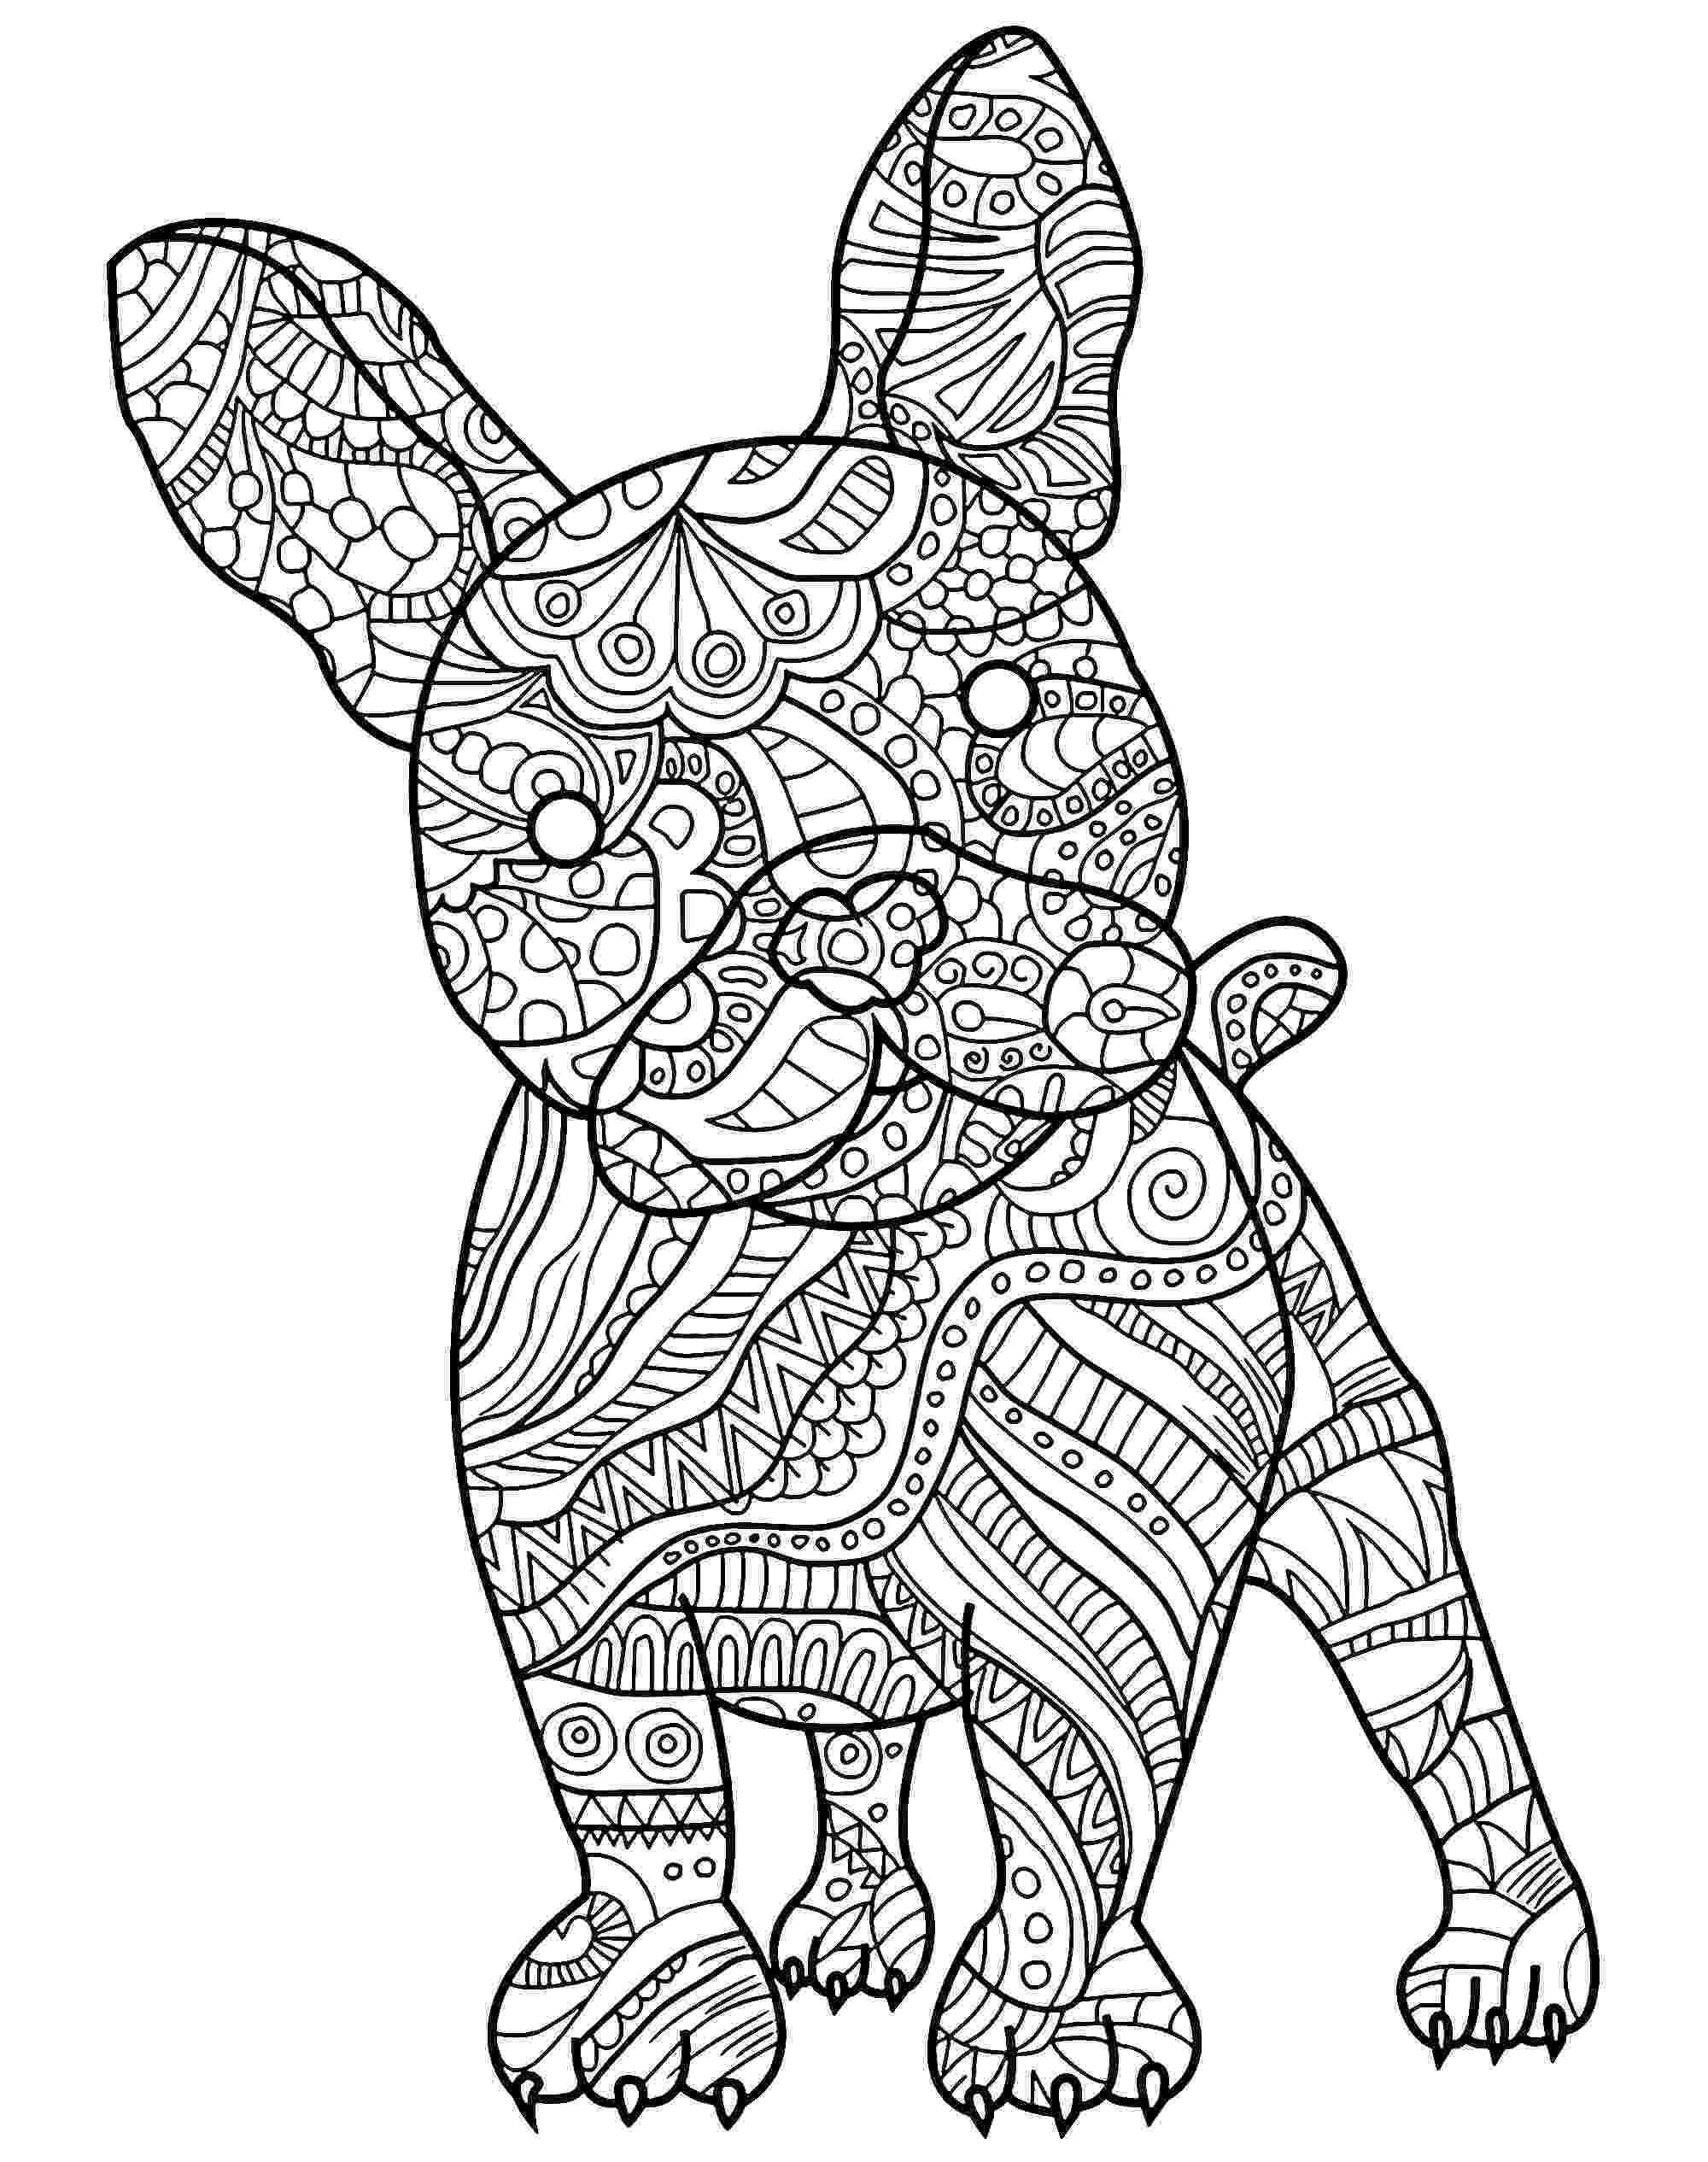 coloring page of dog free printable dog coloring pages for kids page dog coloring of 1 1